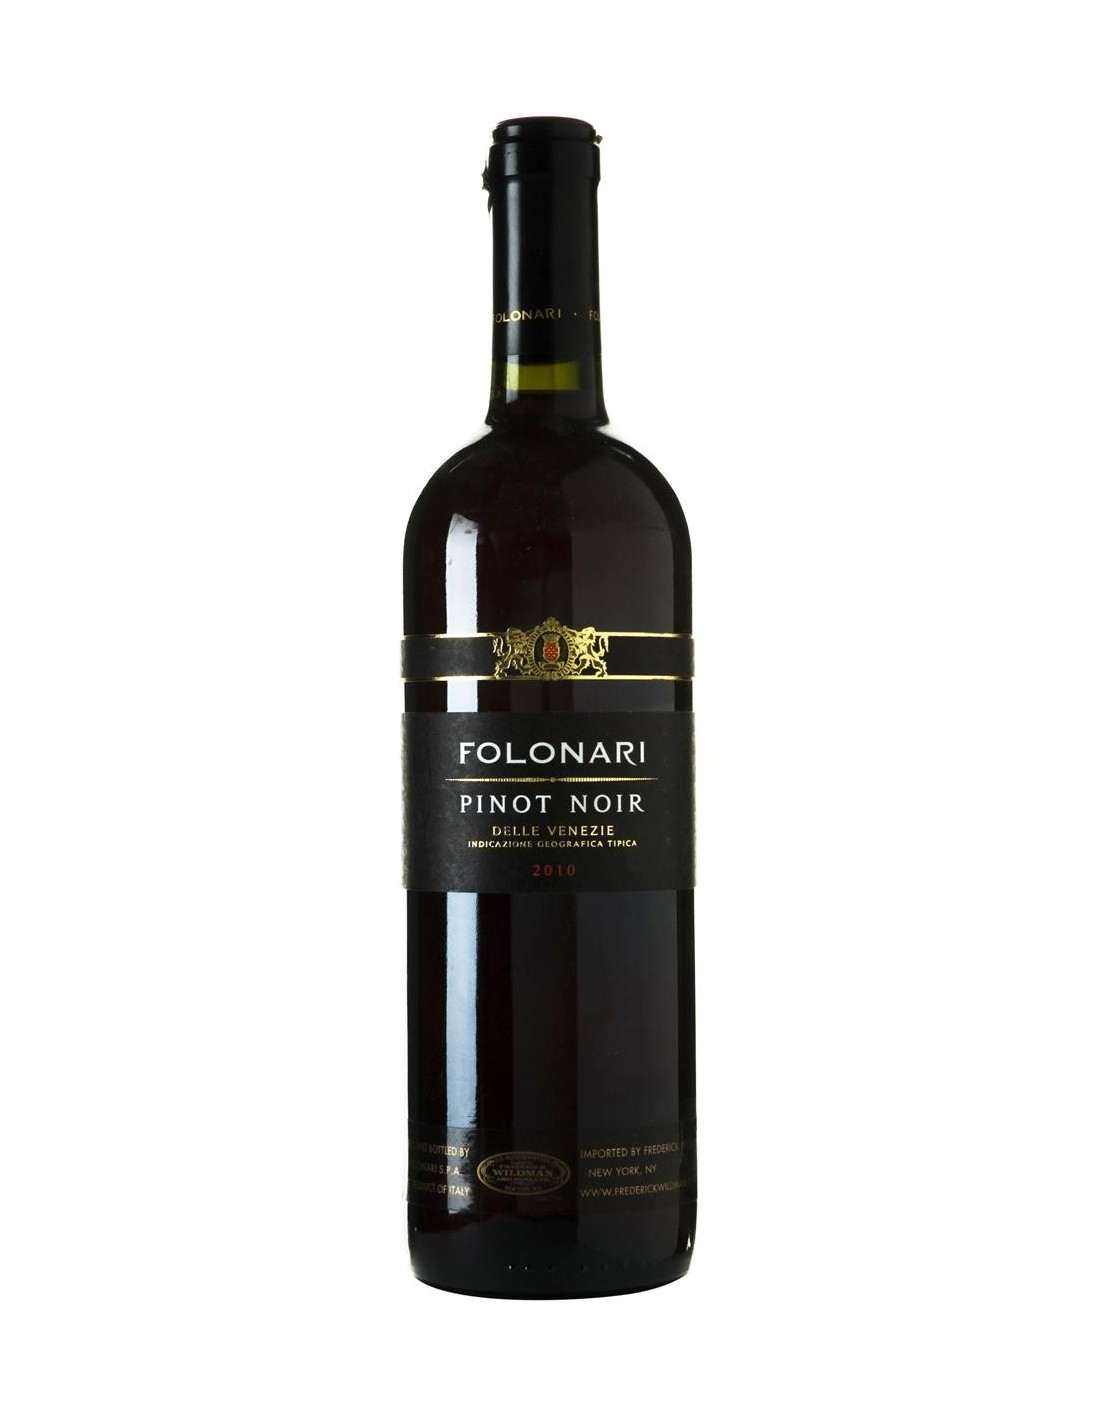 Vin rosu, Pinot Noir, Folonari Delle Venezie, 0.75L, 12.5% alc., Italia